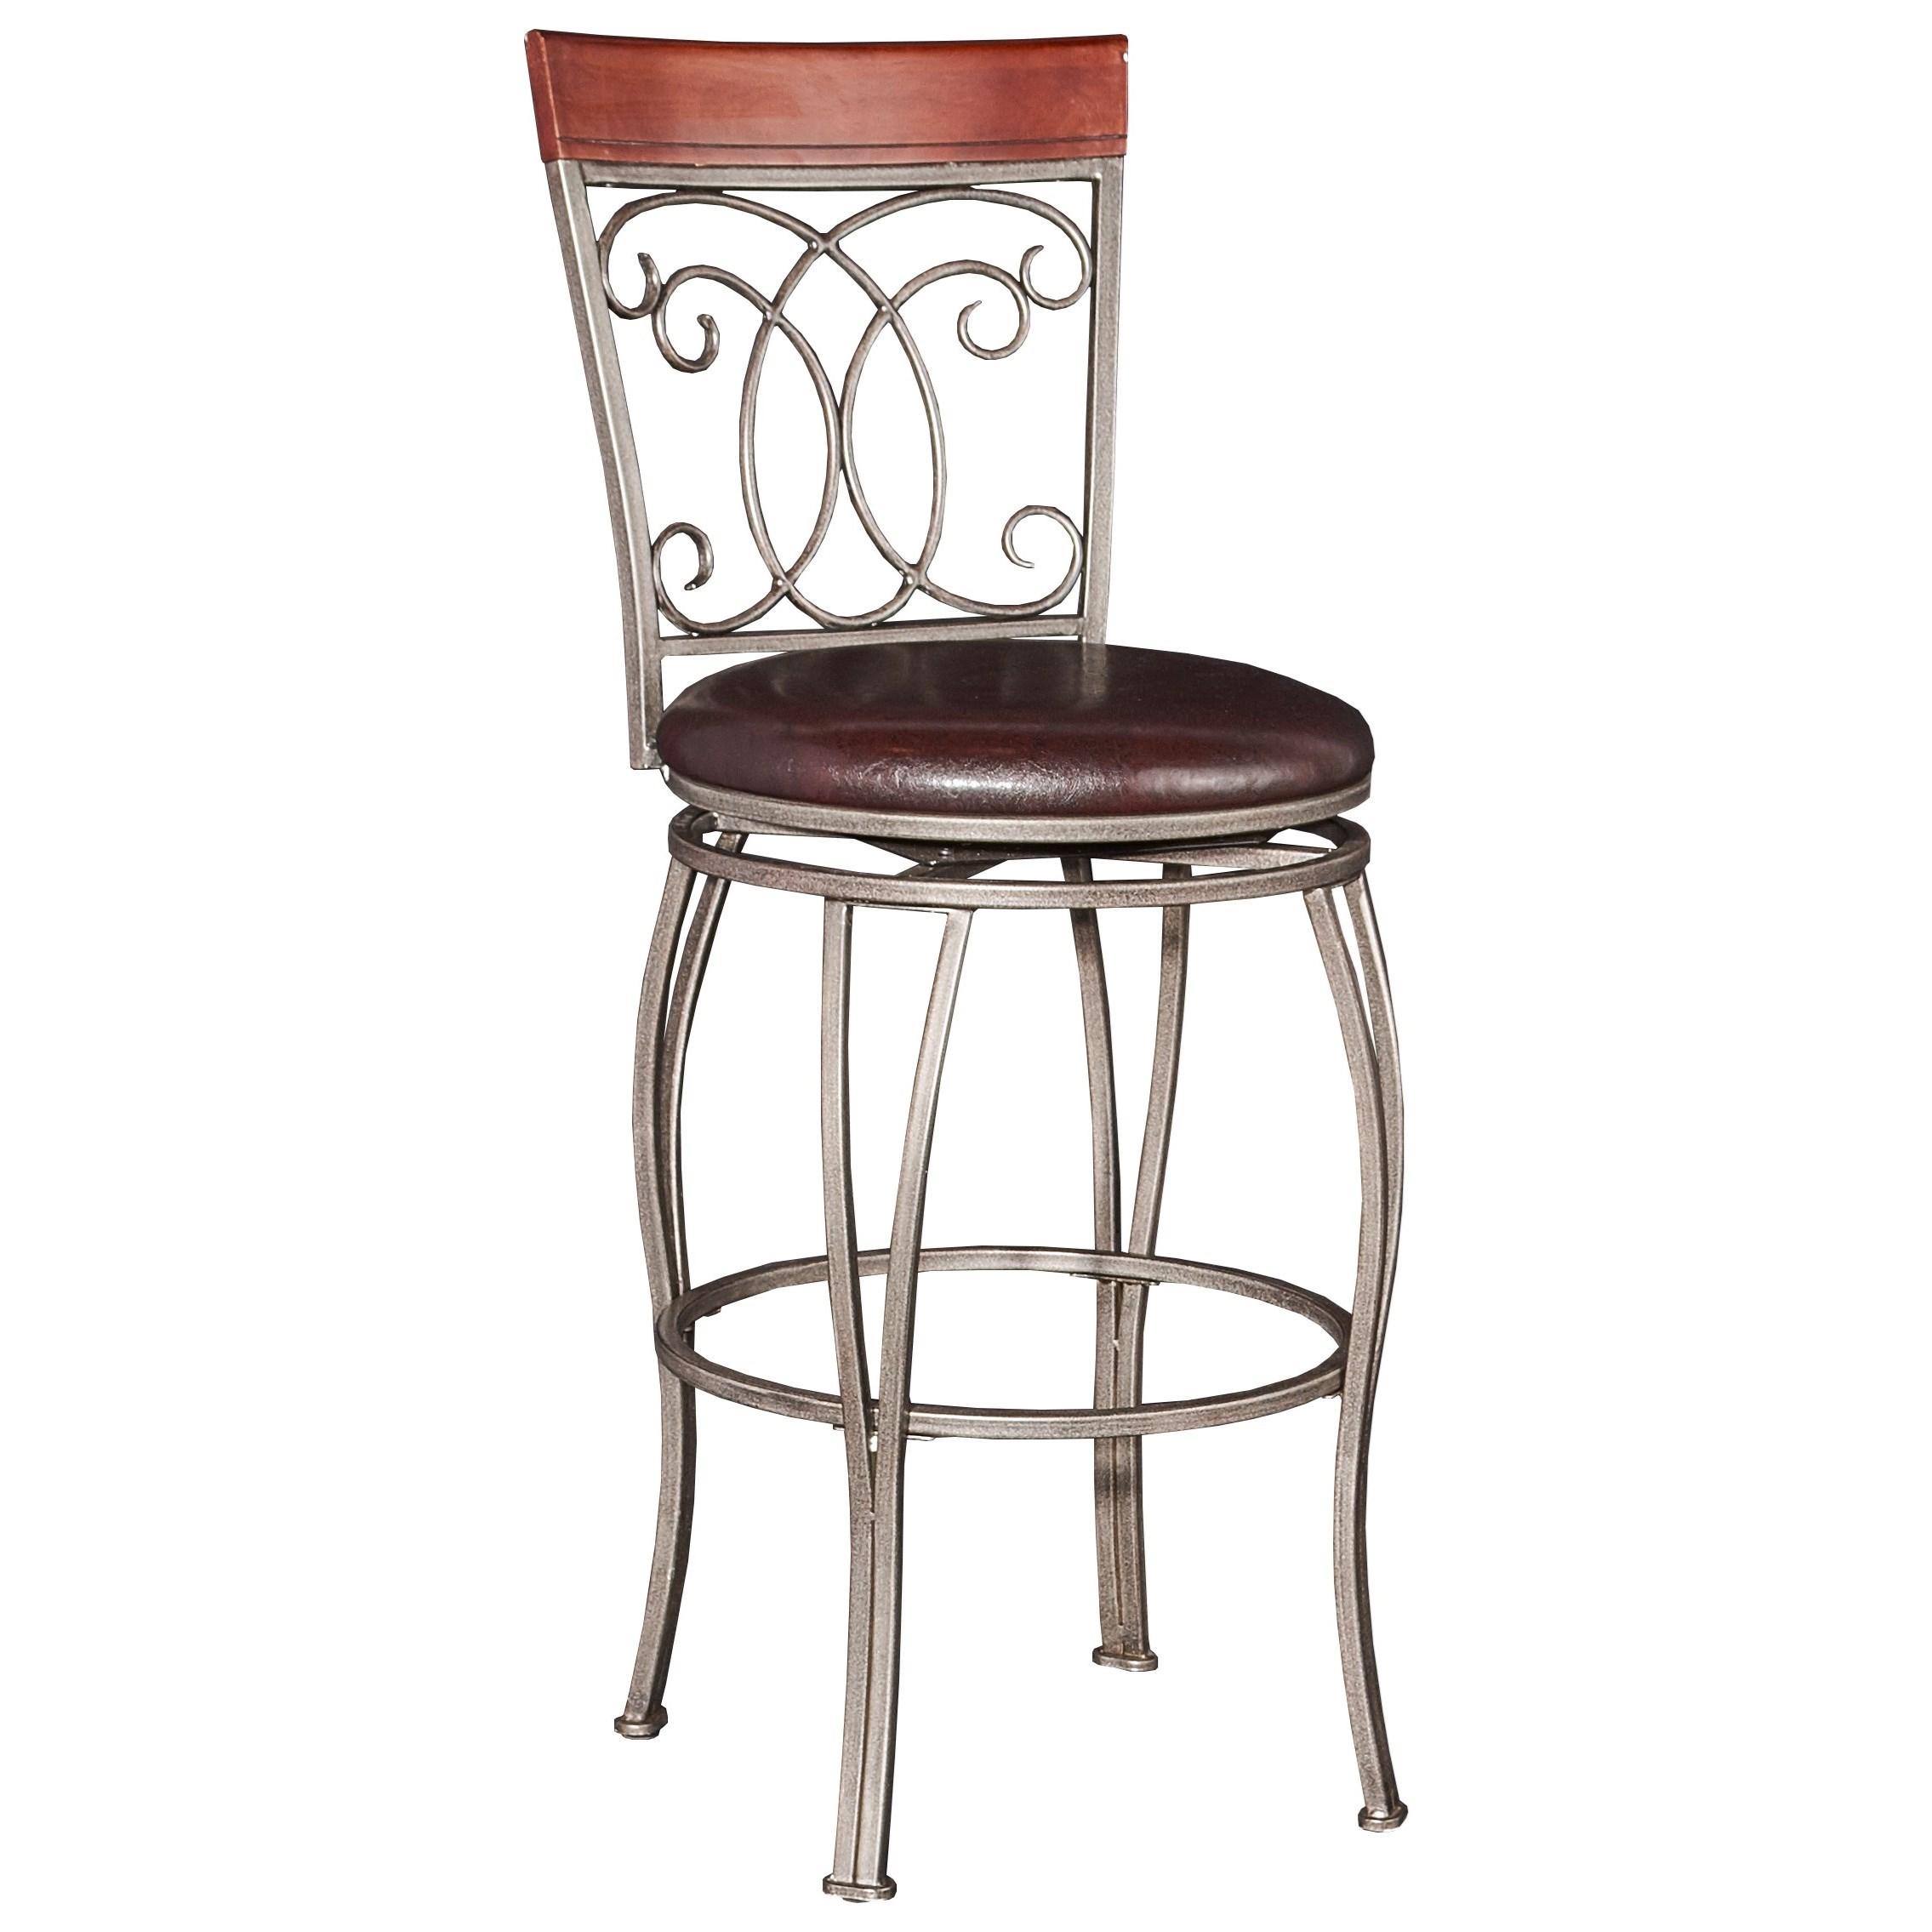 Powell Bar Stools & Tables Bailey Counter Stool - Item Number: 16B8217CS